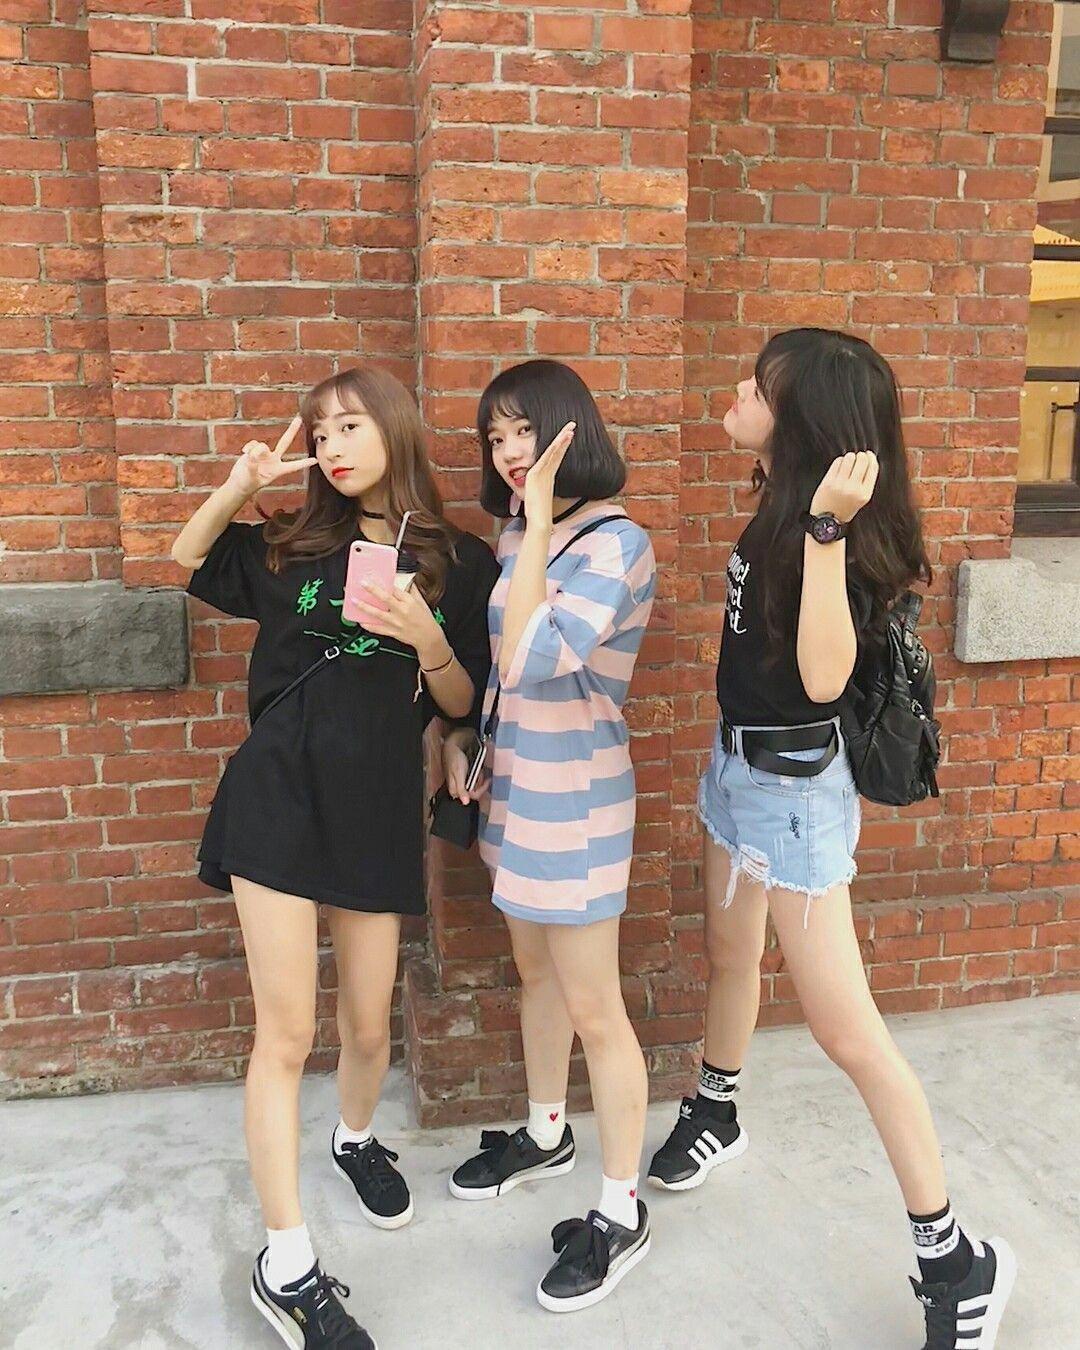 Looking for korean friends